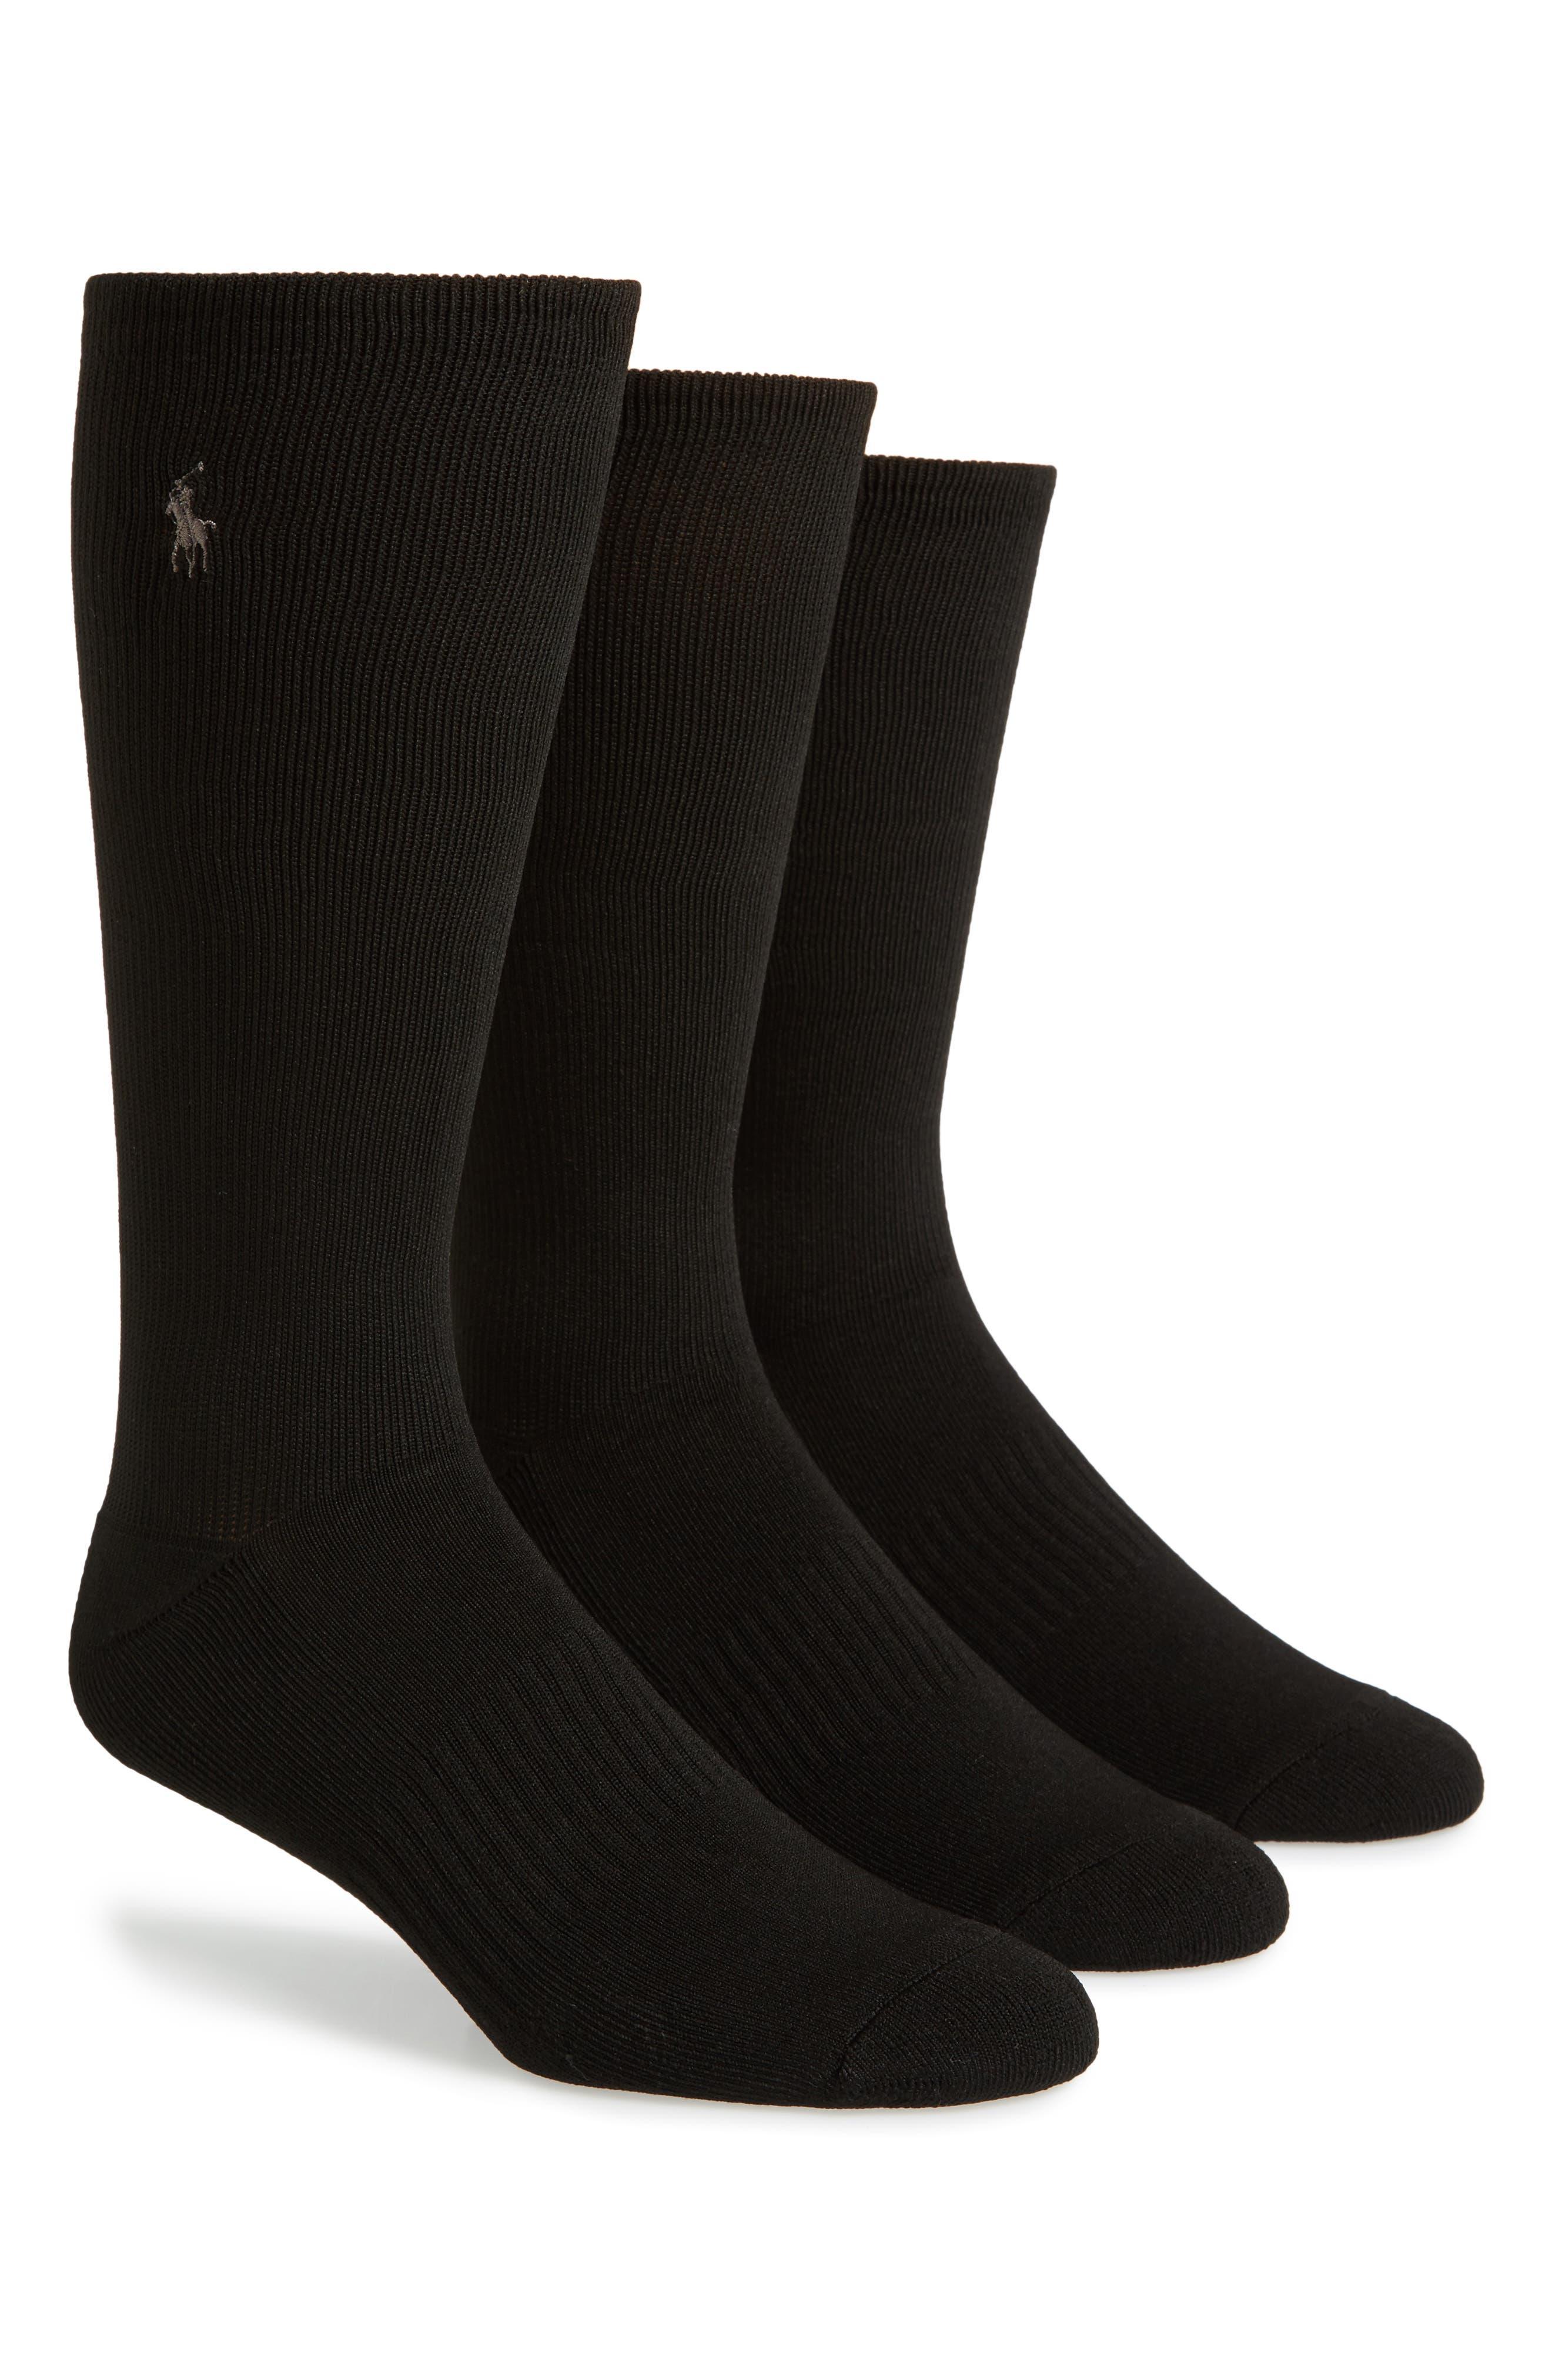 Alternate Image 1 Selected - Polo Ralph Lauren 3-Pack Compression Socks